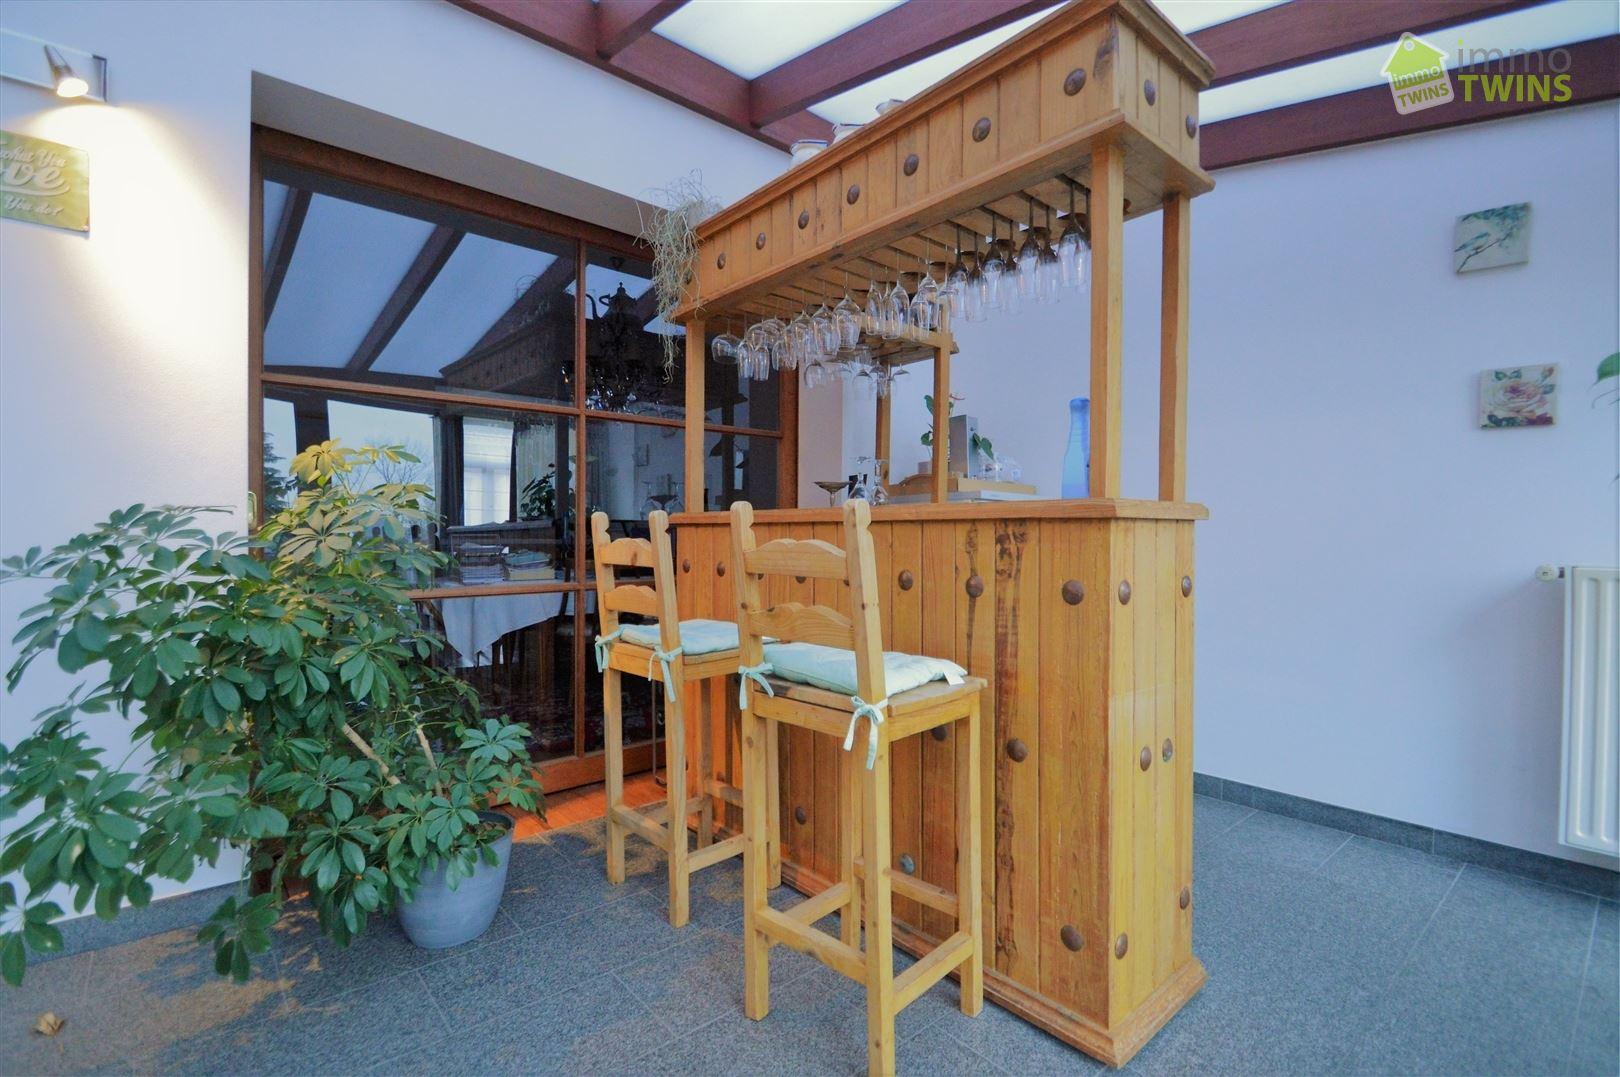 Foto 12 : Duplex/Penthouse te 2890 SINT-AMANDS (België) - Prijs € 429.000